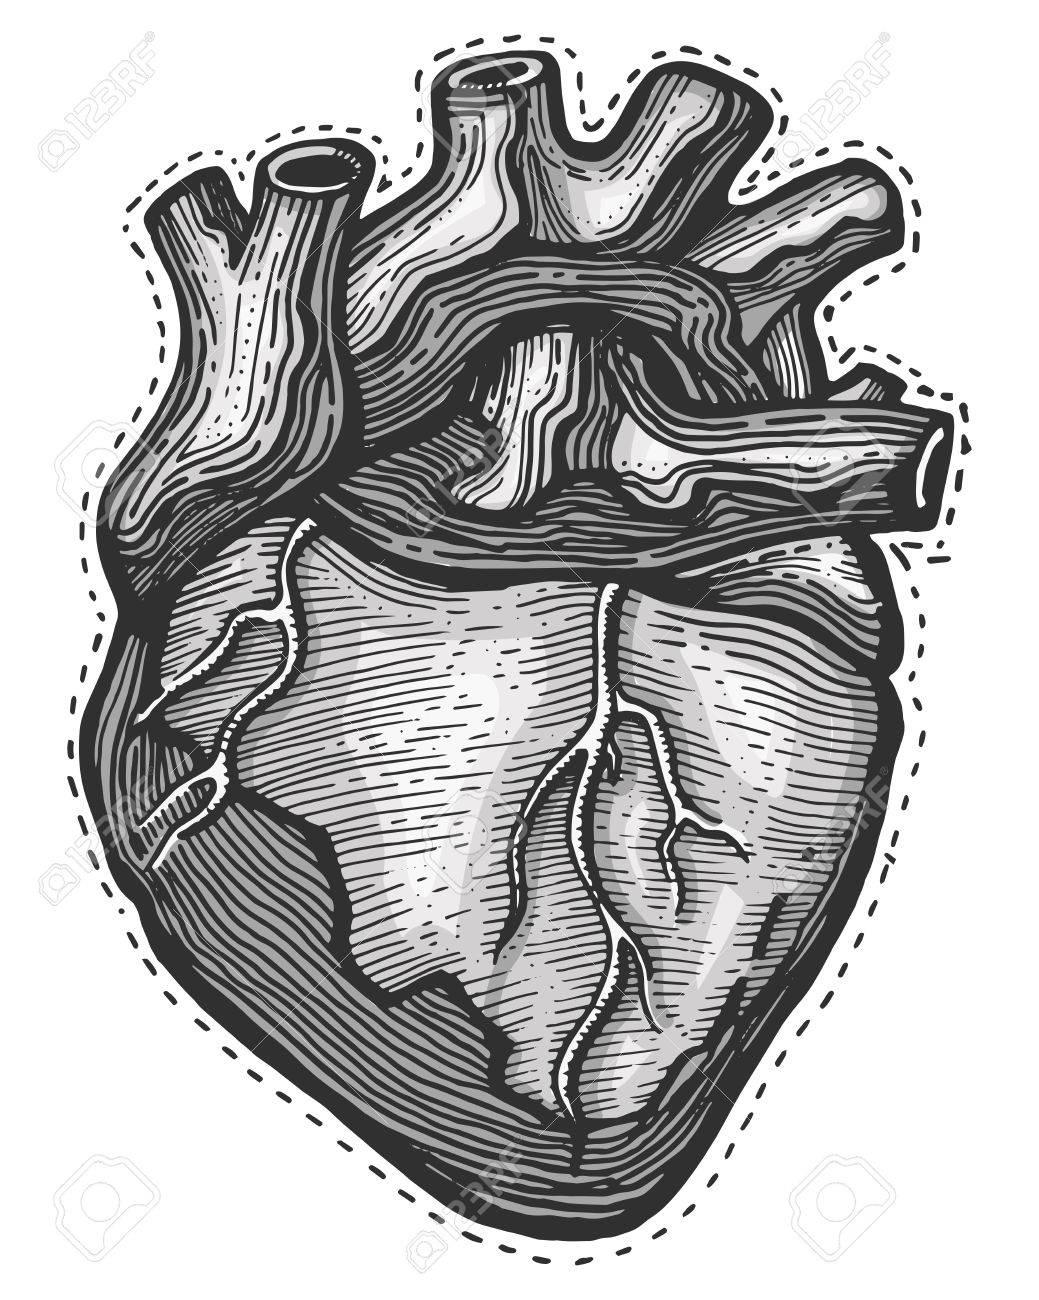 Illustrtion Vector Dibujado A Mano O Dibujo De Un Corazón Humano